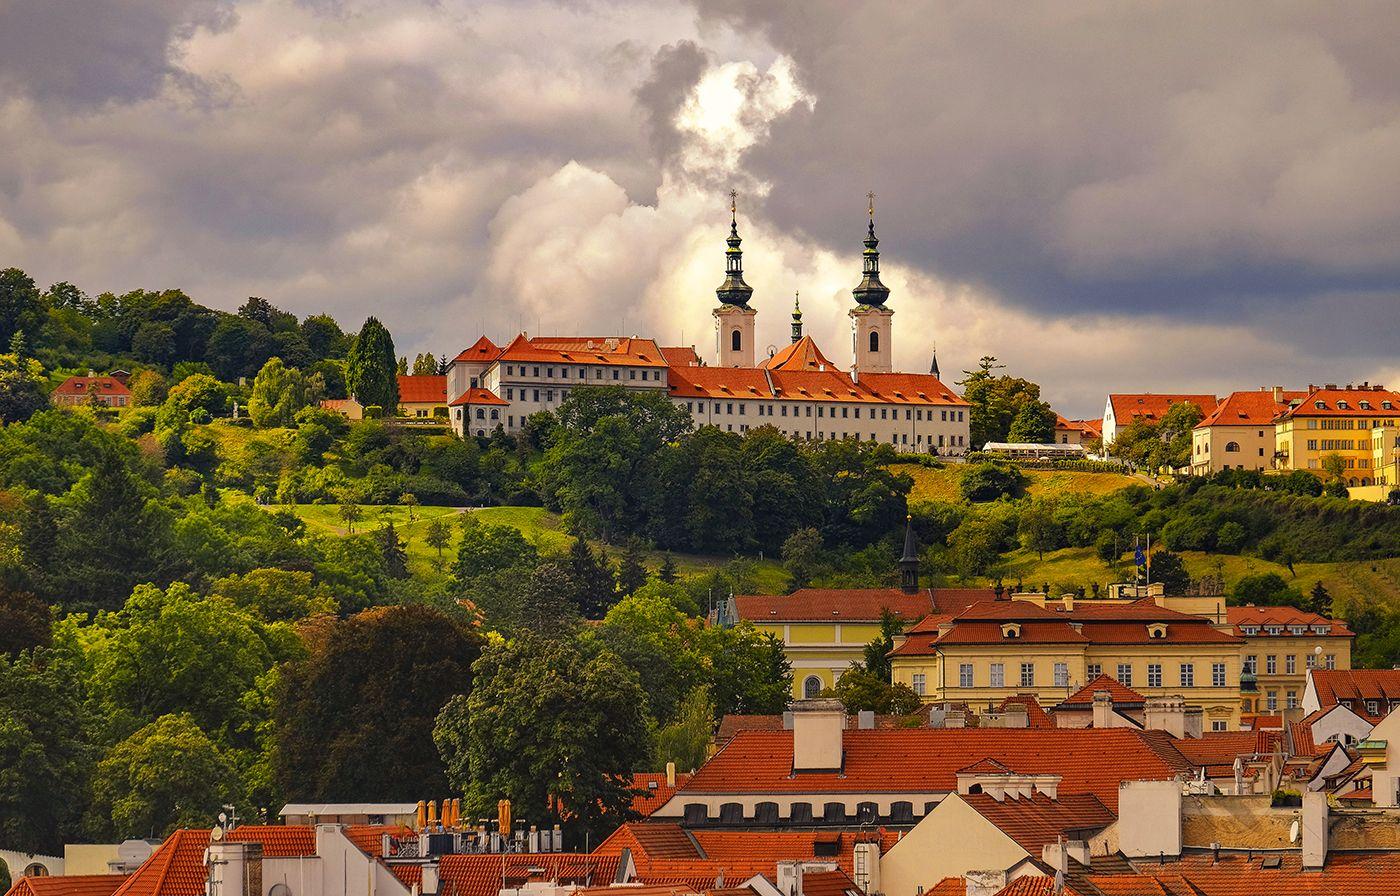 Страговский монастырь Прага Градчаны